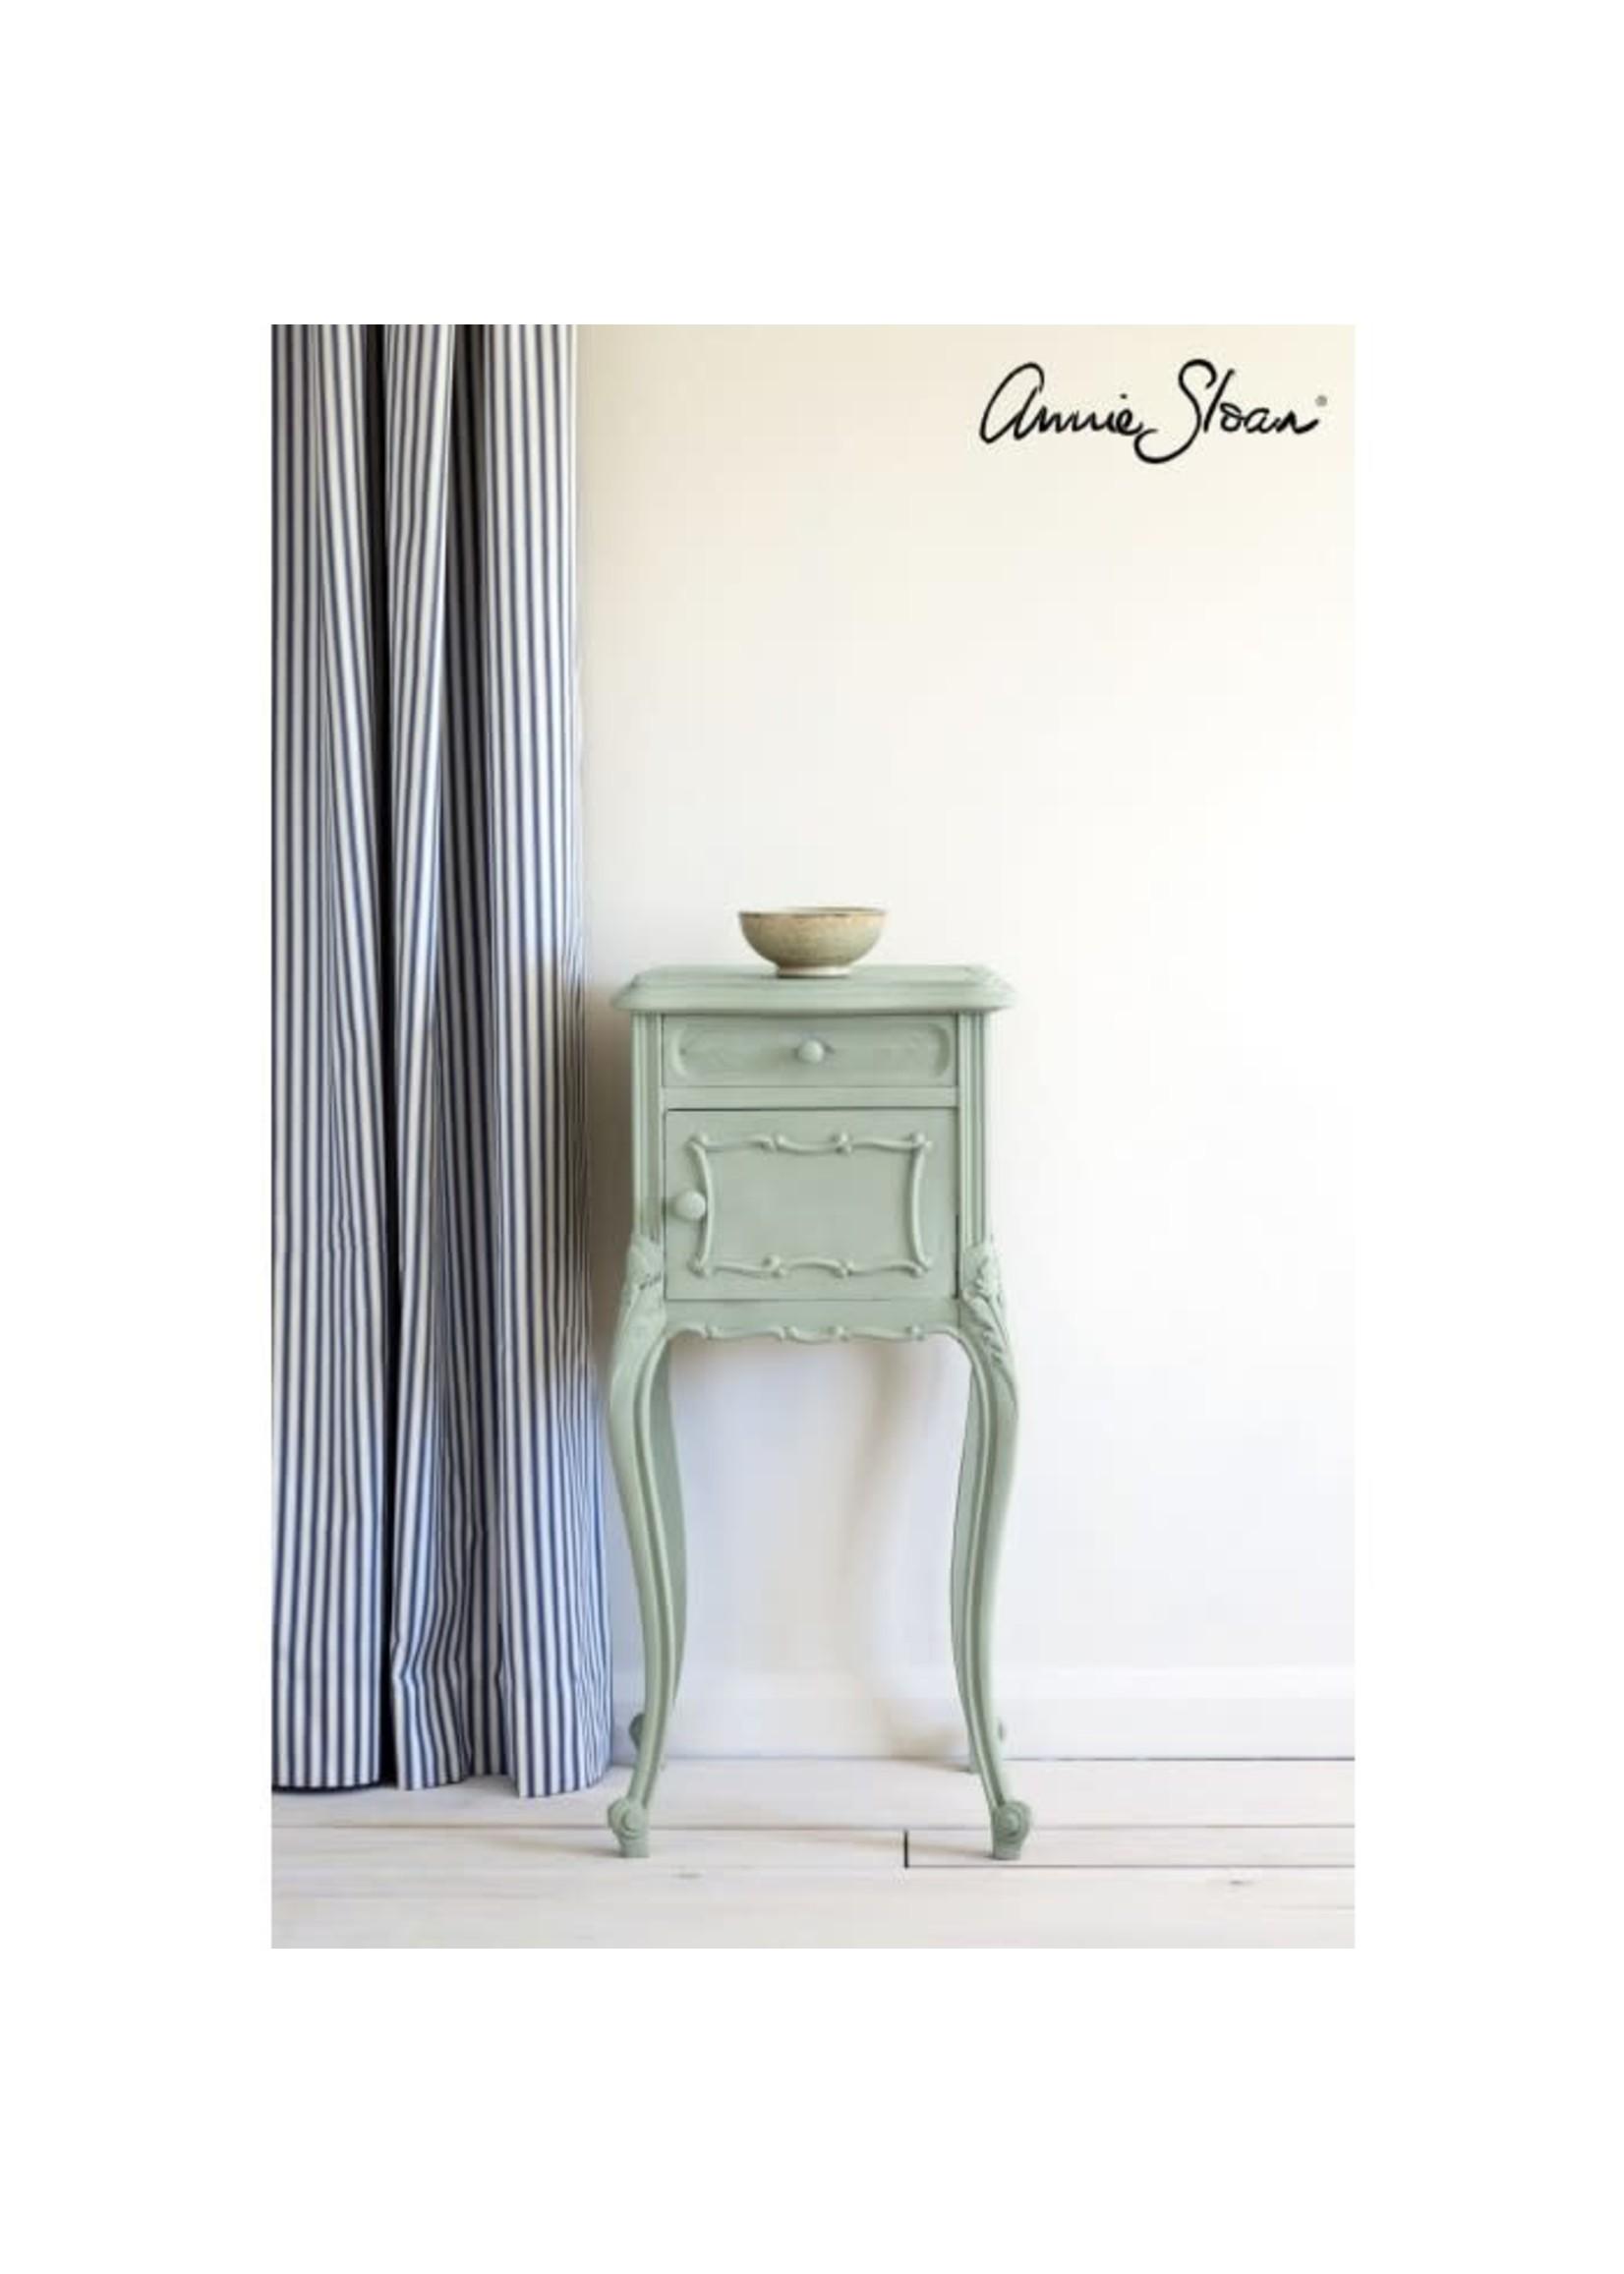 Annie Sloan Chalk Paint® Svenska Annie Sloan Chalk Paint ®